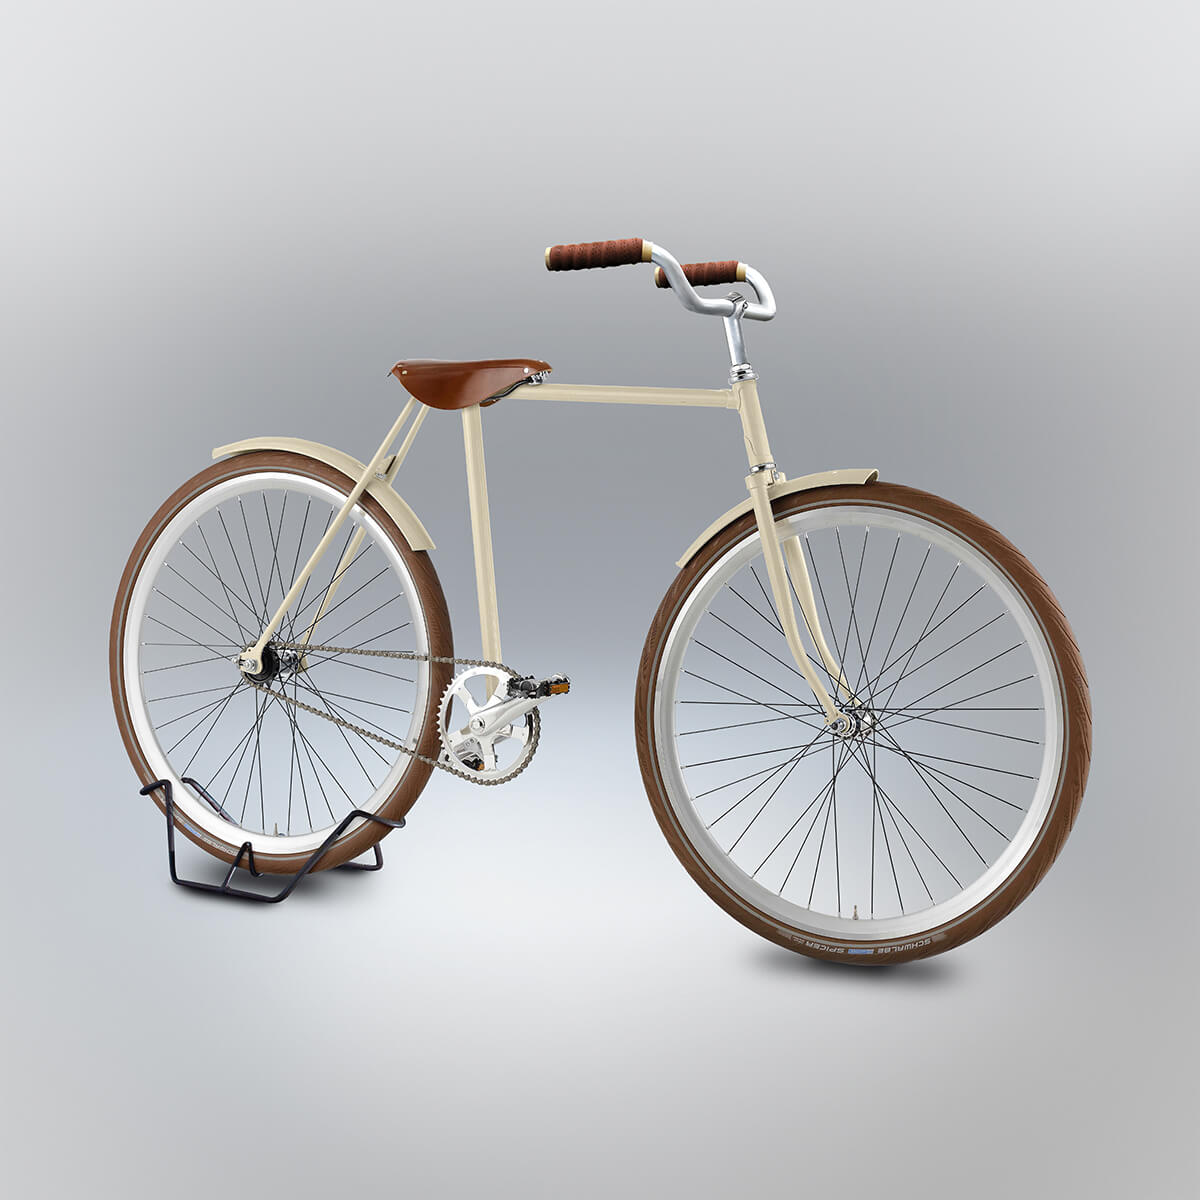 gianluca-gimini-bikes-10